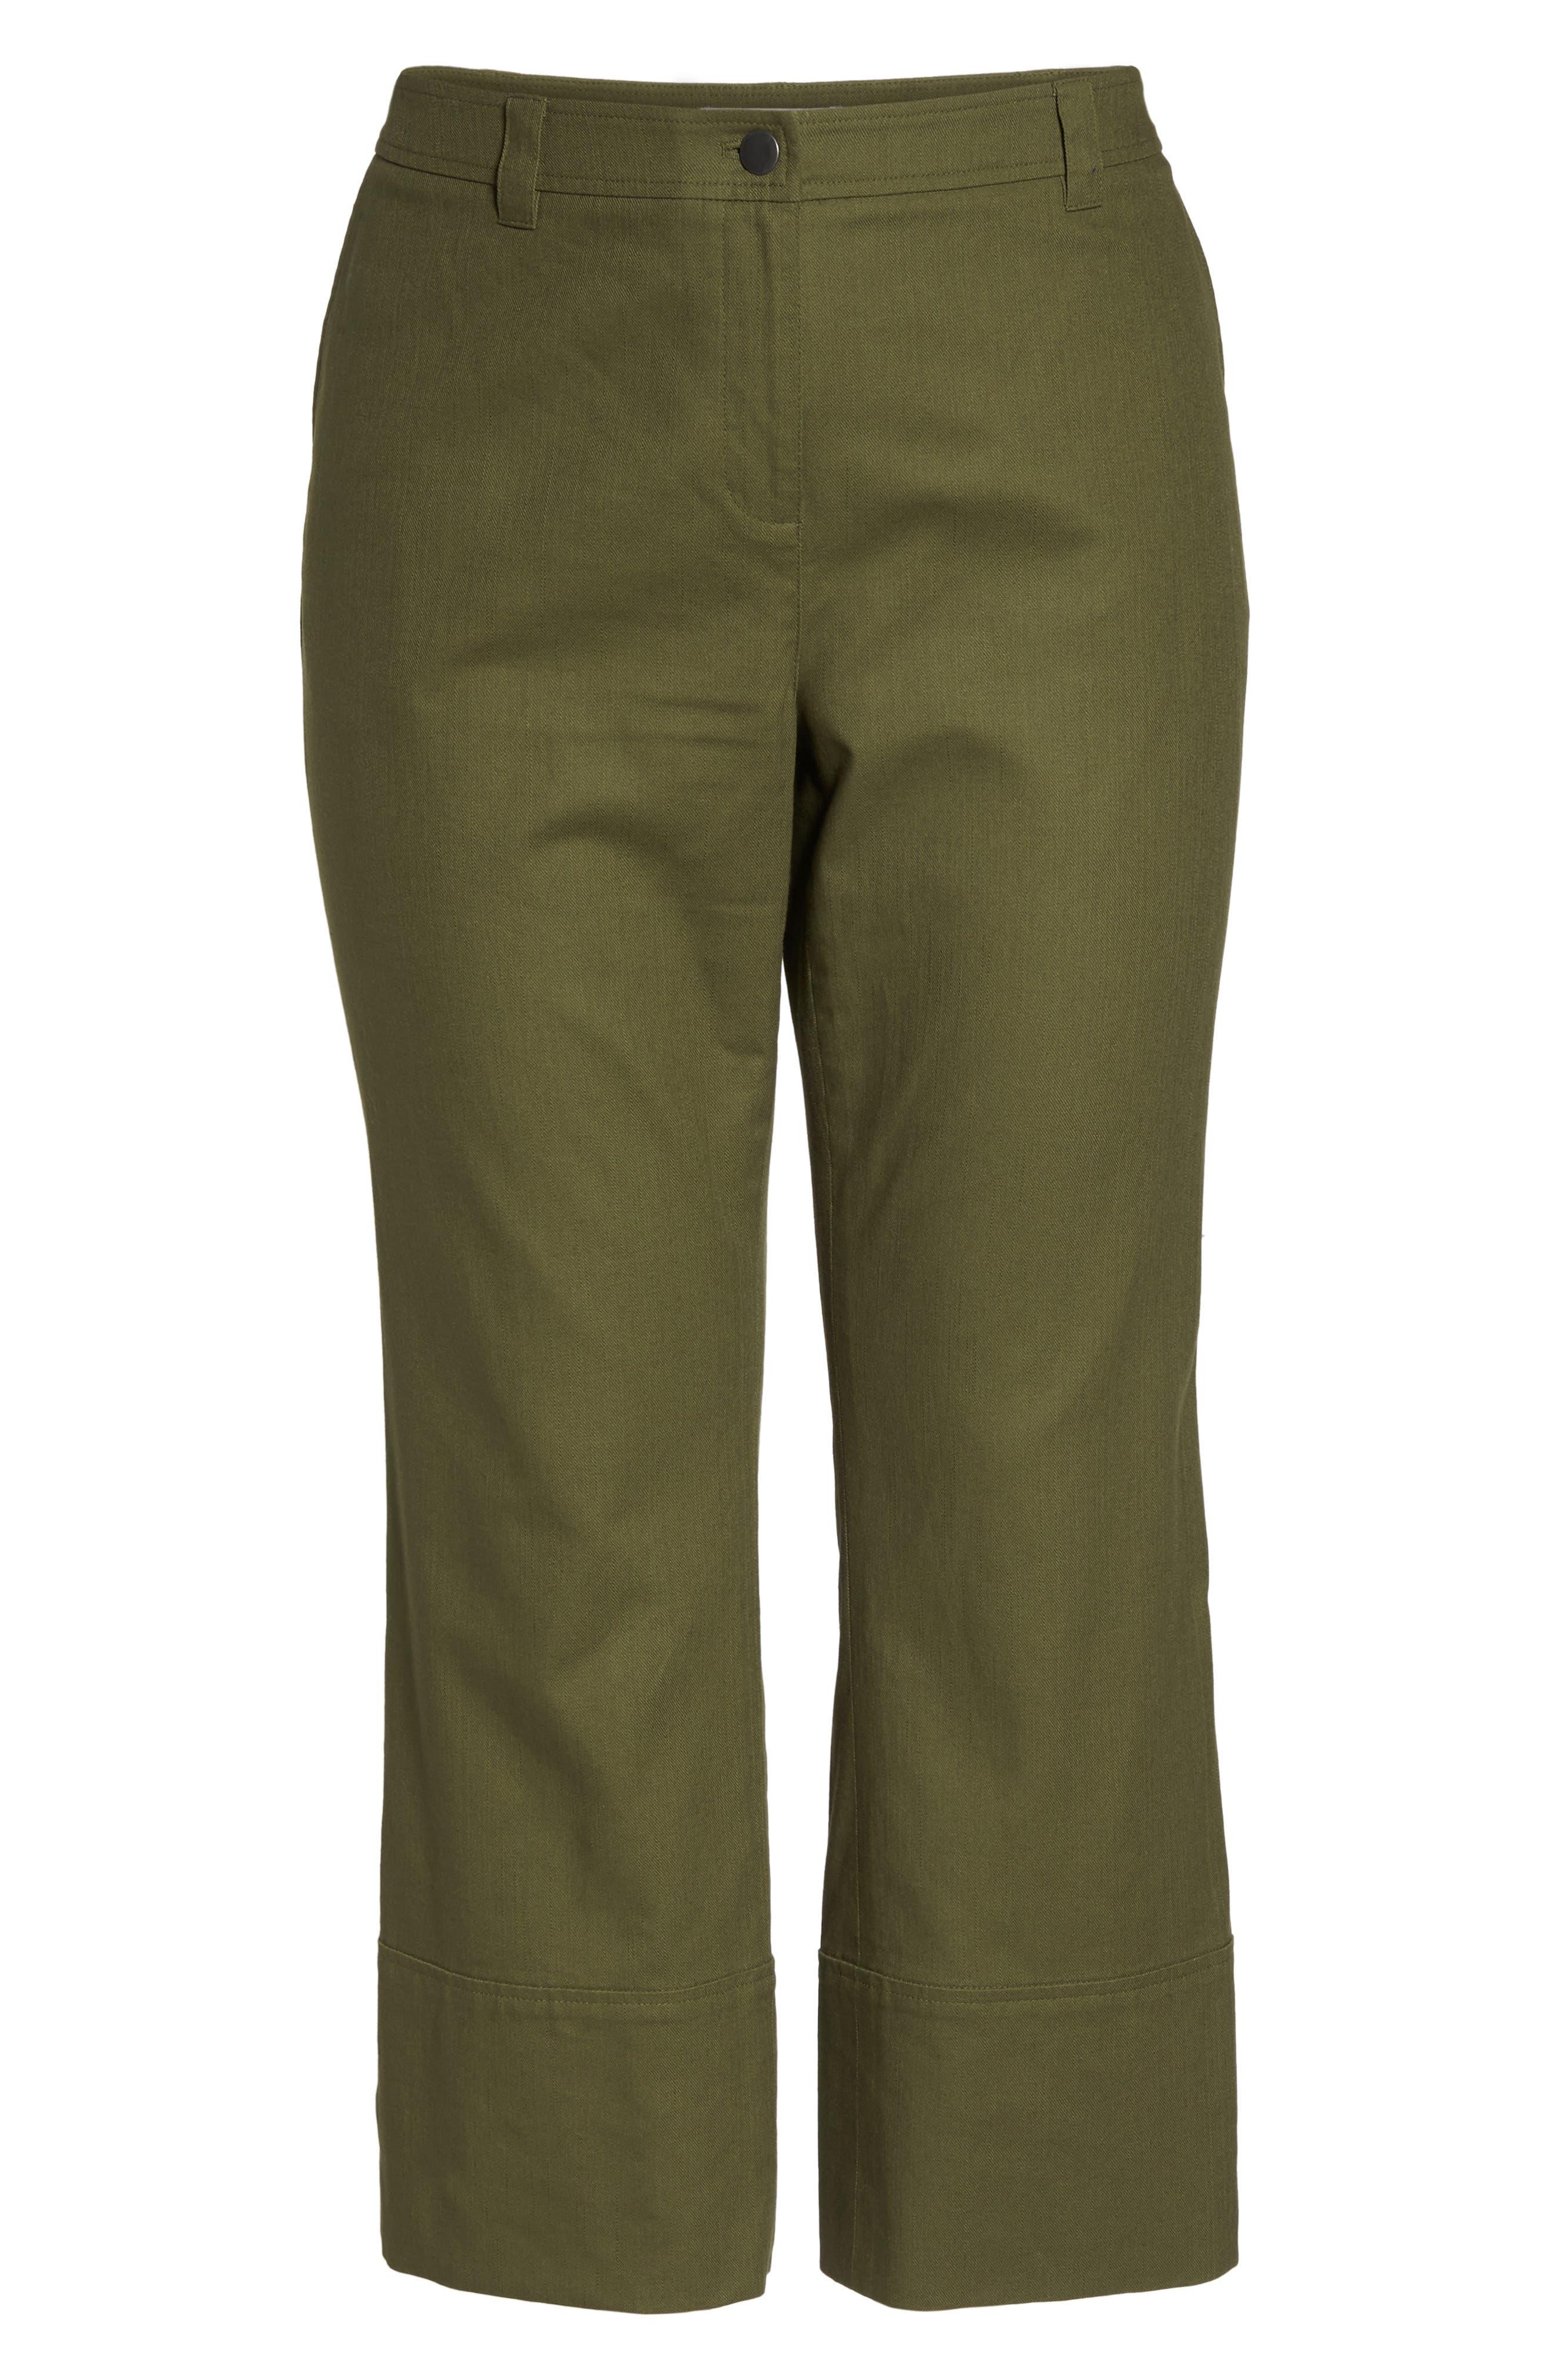 Wide Leg Ankle Pants,                             Alternate thumbnail 6, color,                             Olive Moss